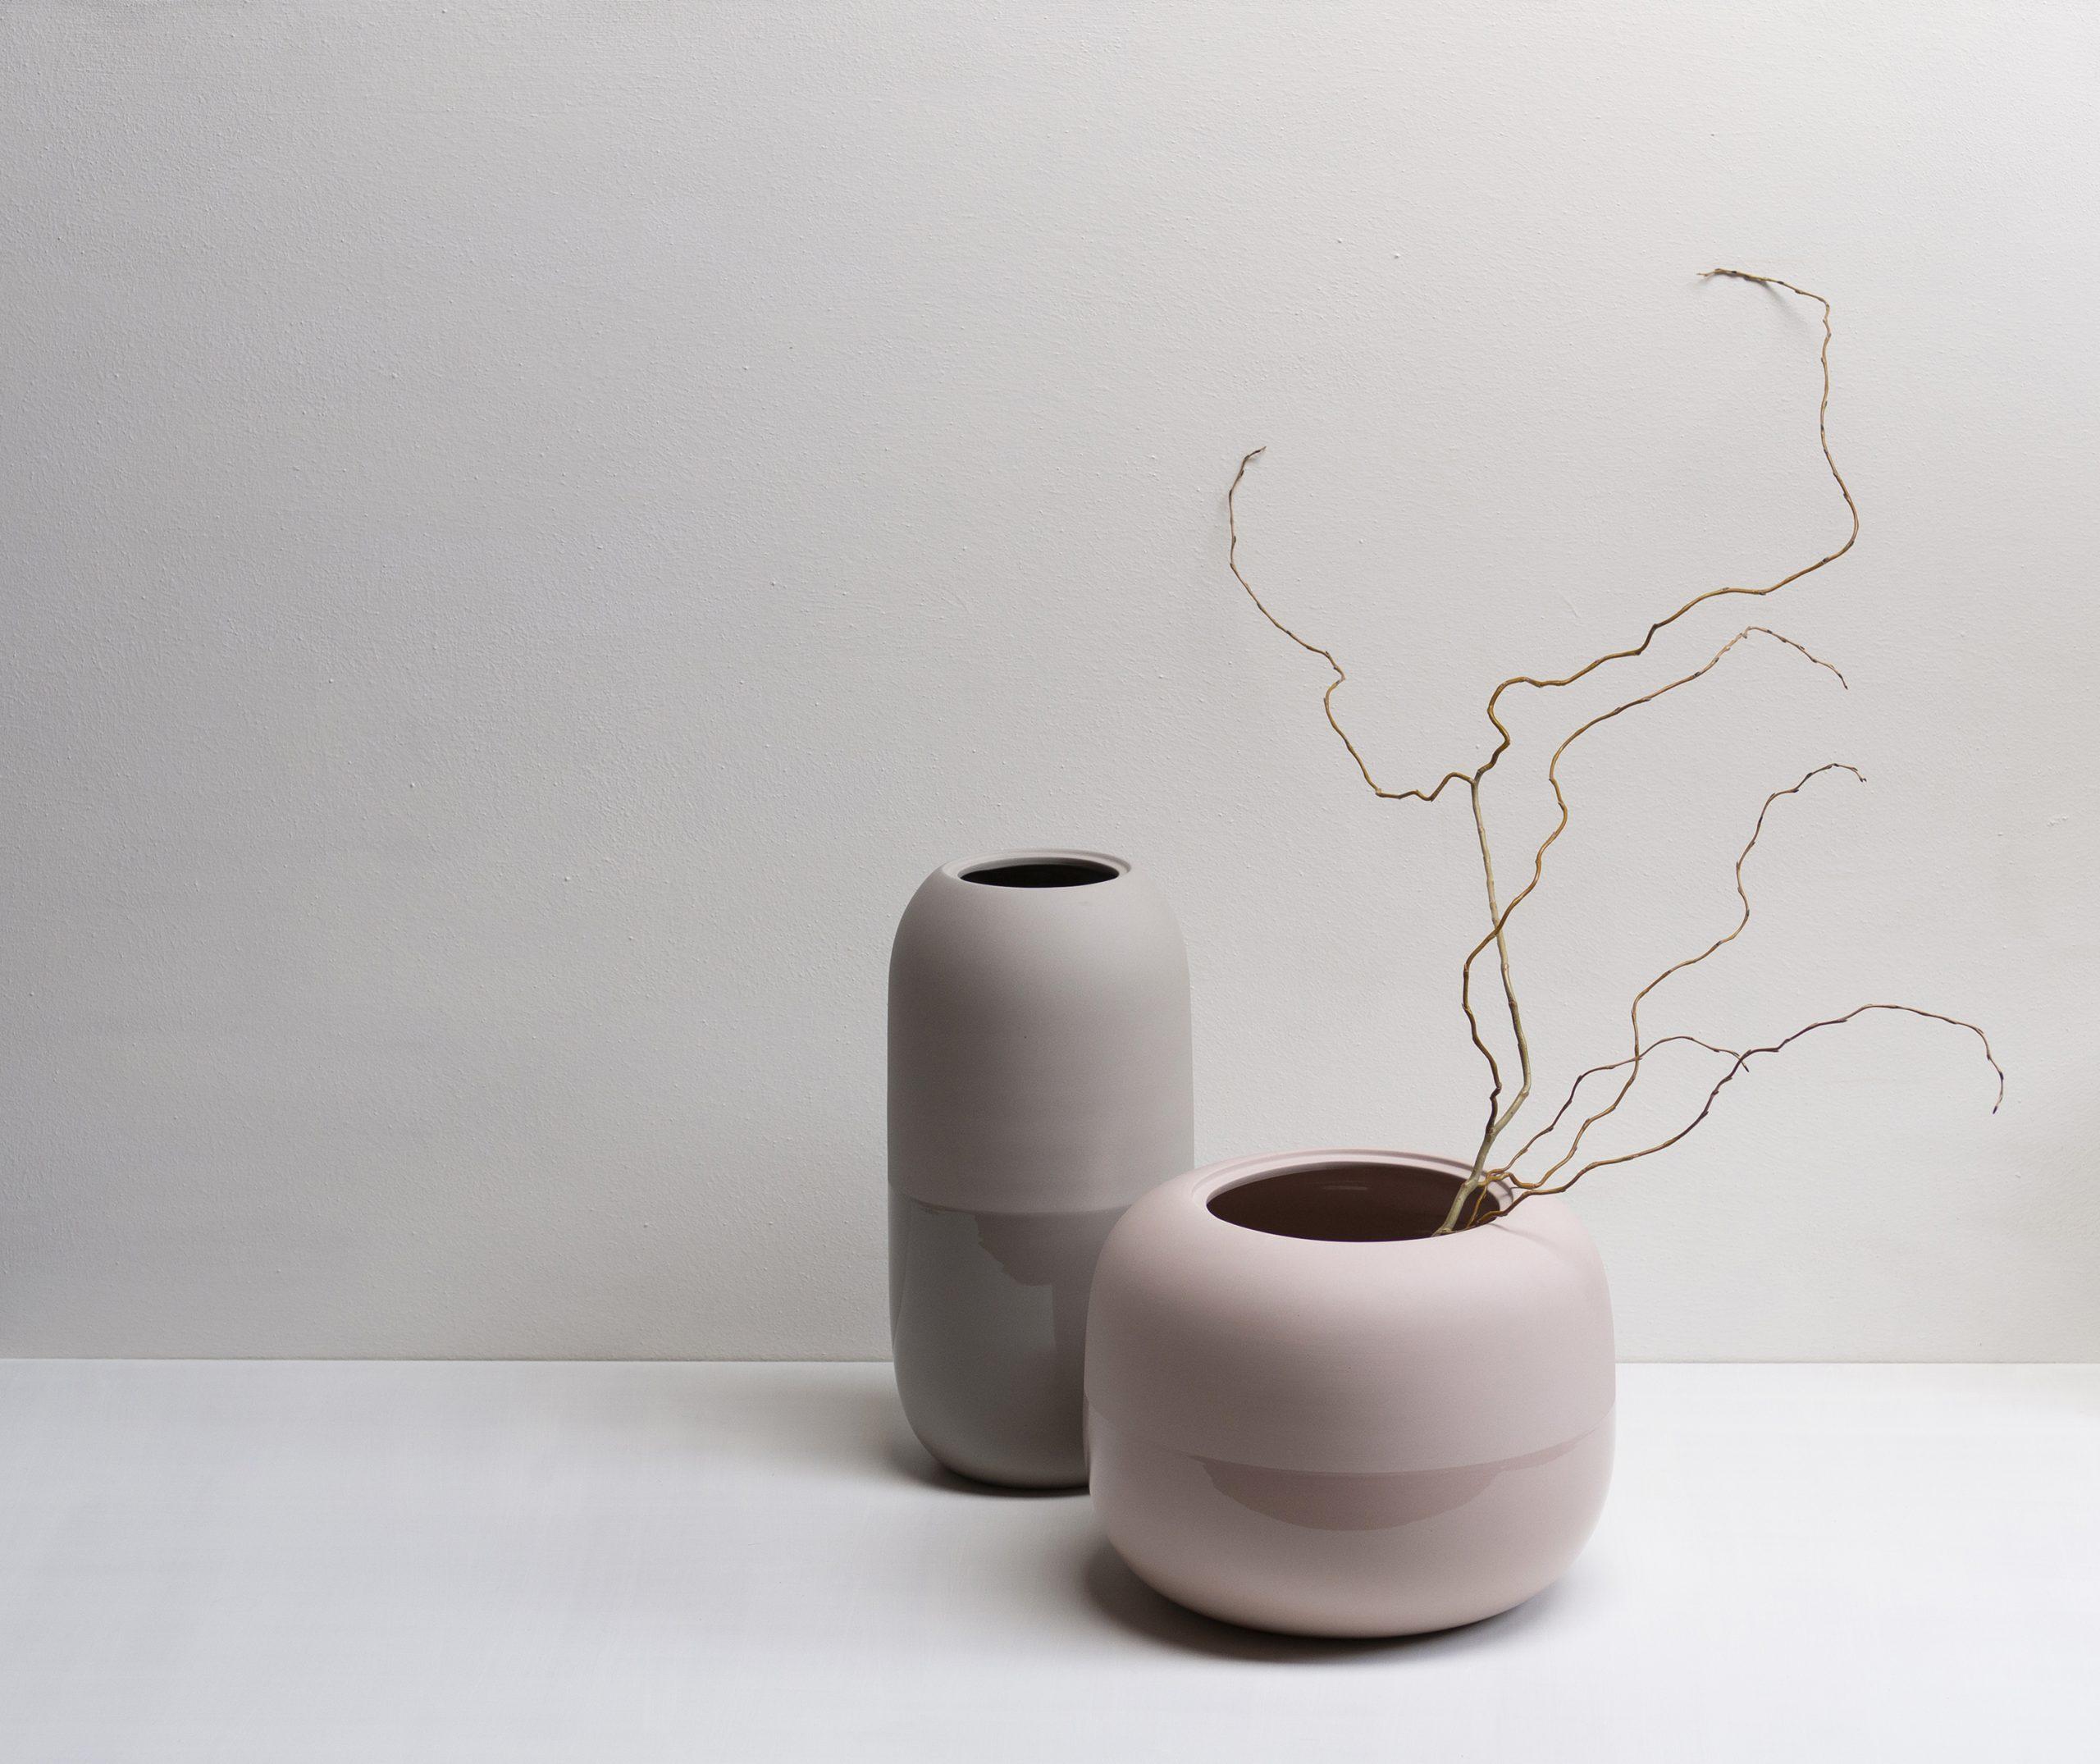 Pepo vases and containers by Debiasi Sandri for Normann Copenhagen